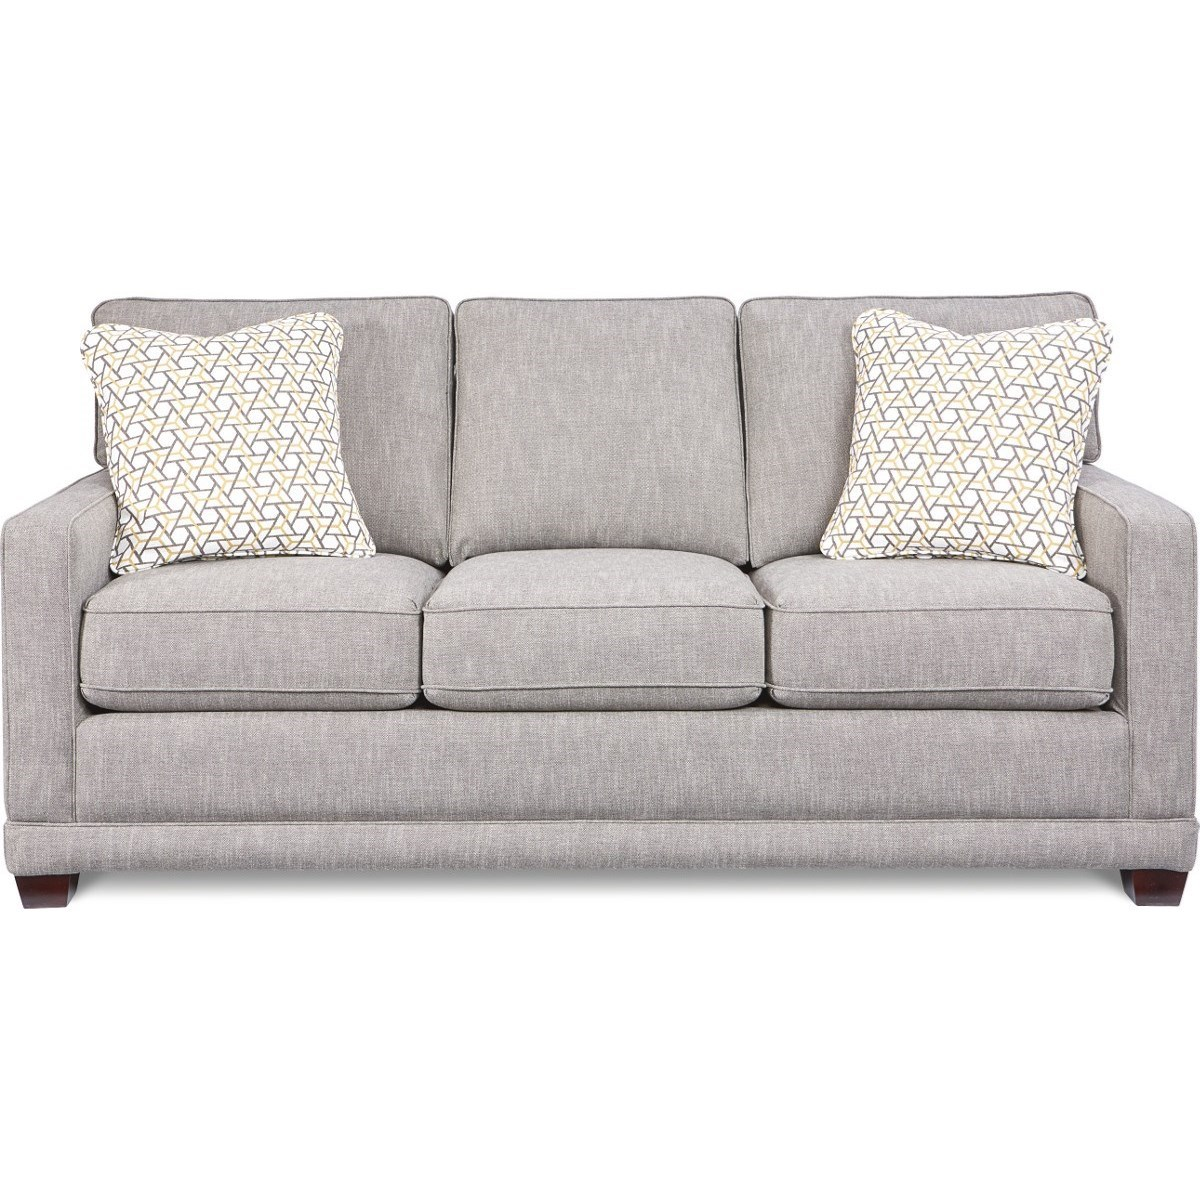 Transitional SUPREME-COMFORT™ Queen Sleep Sofa